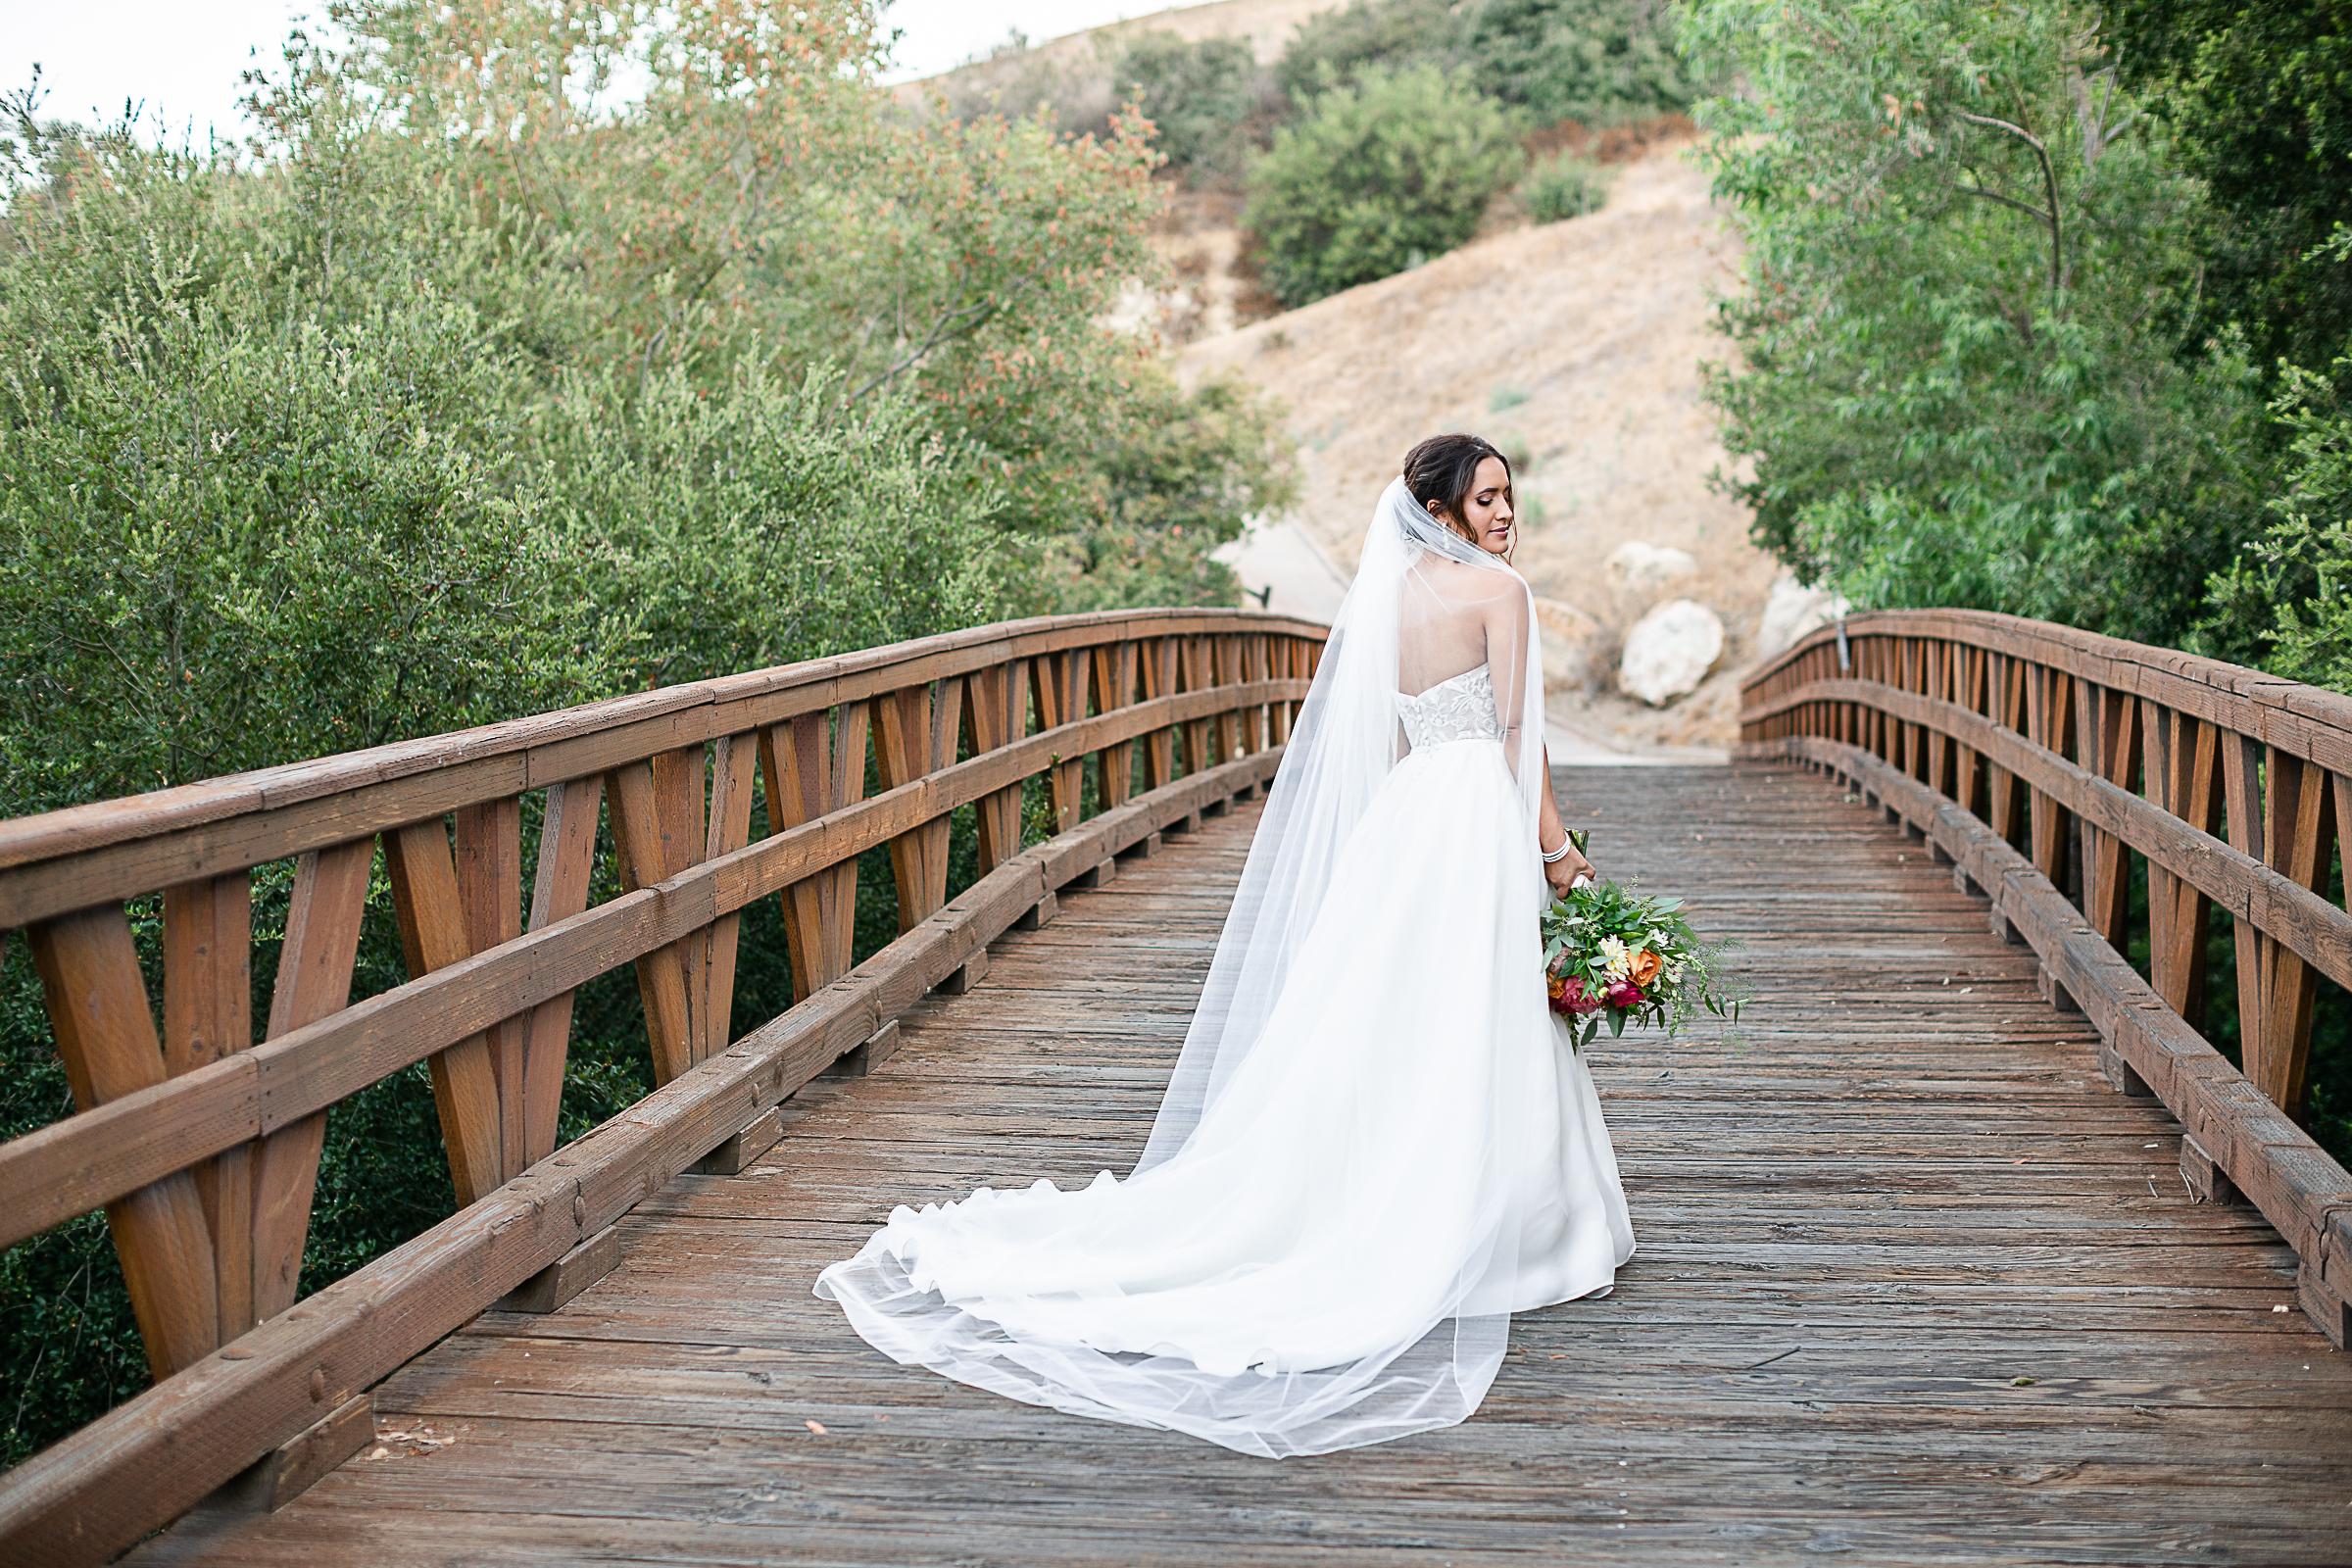 Medina and Arash's Vellano Country Club Wedding, Chino Hills-20.jpg